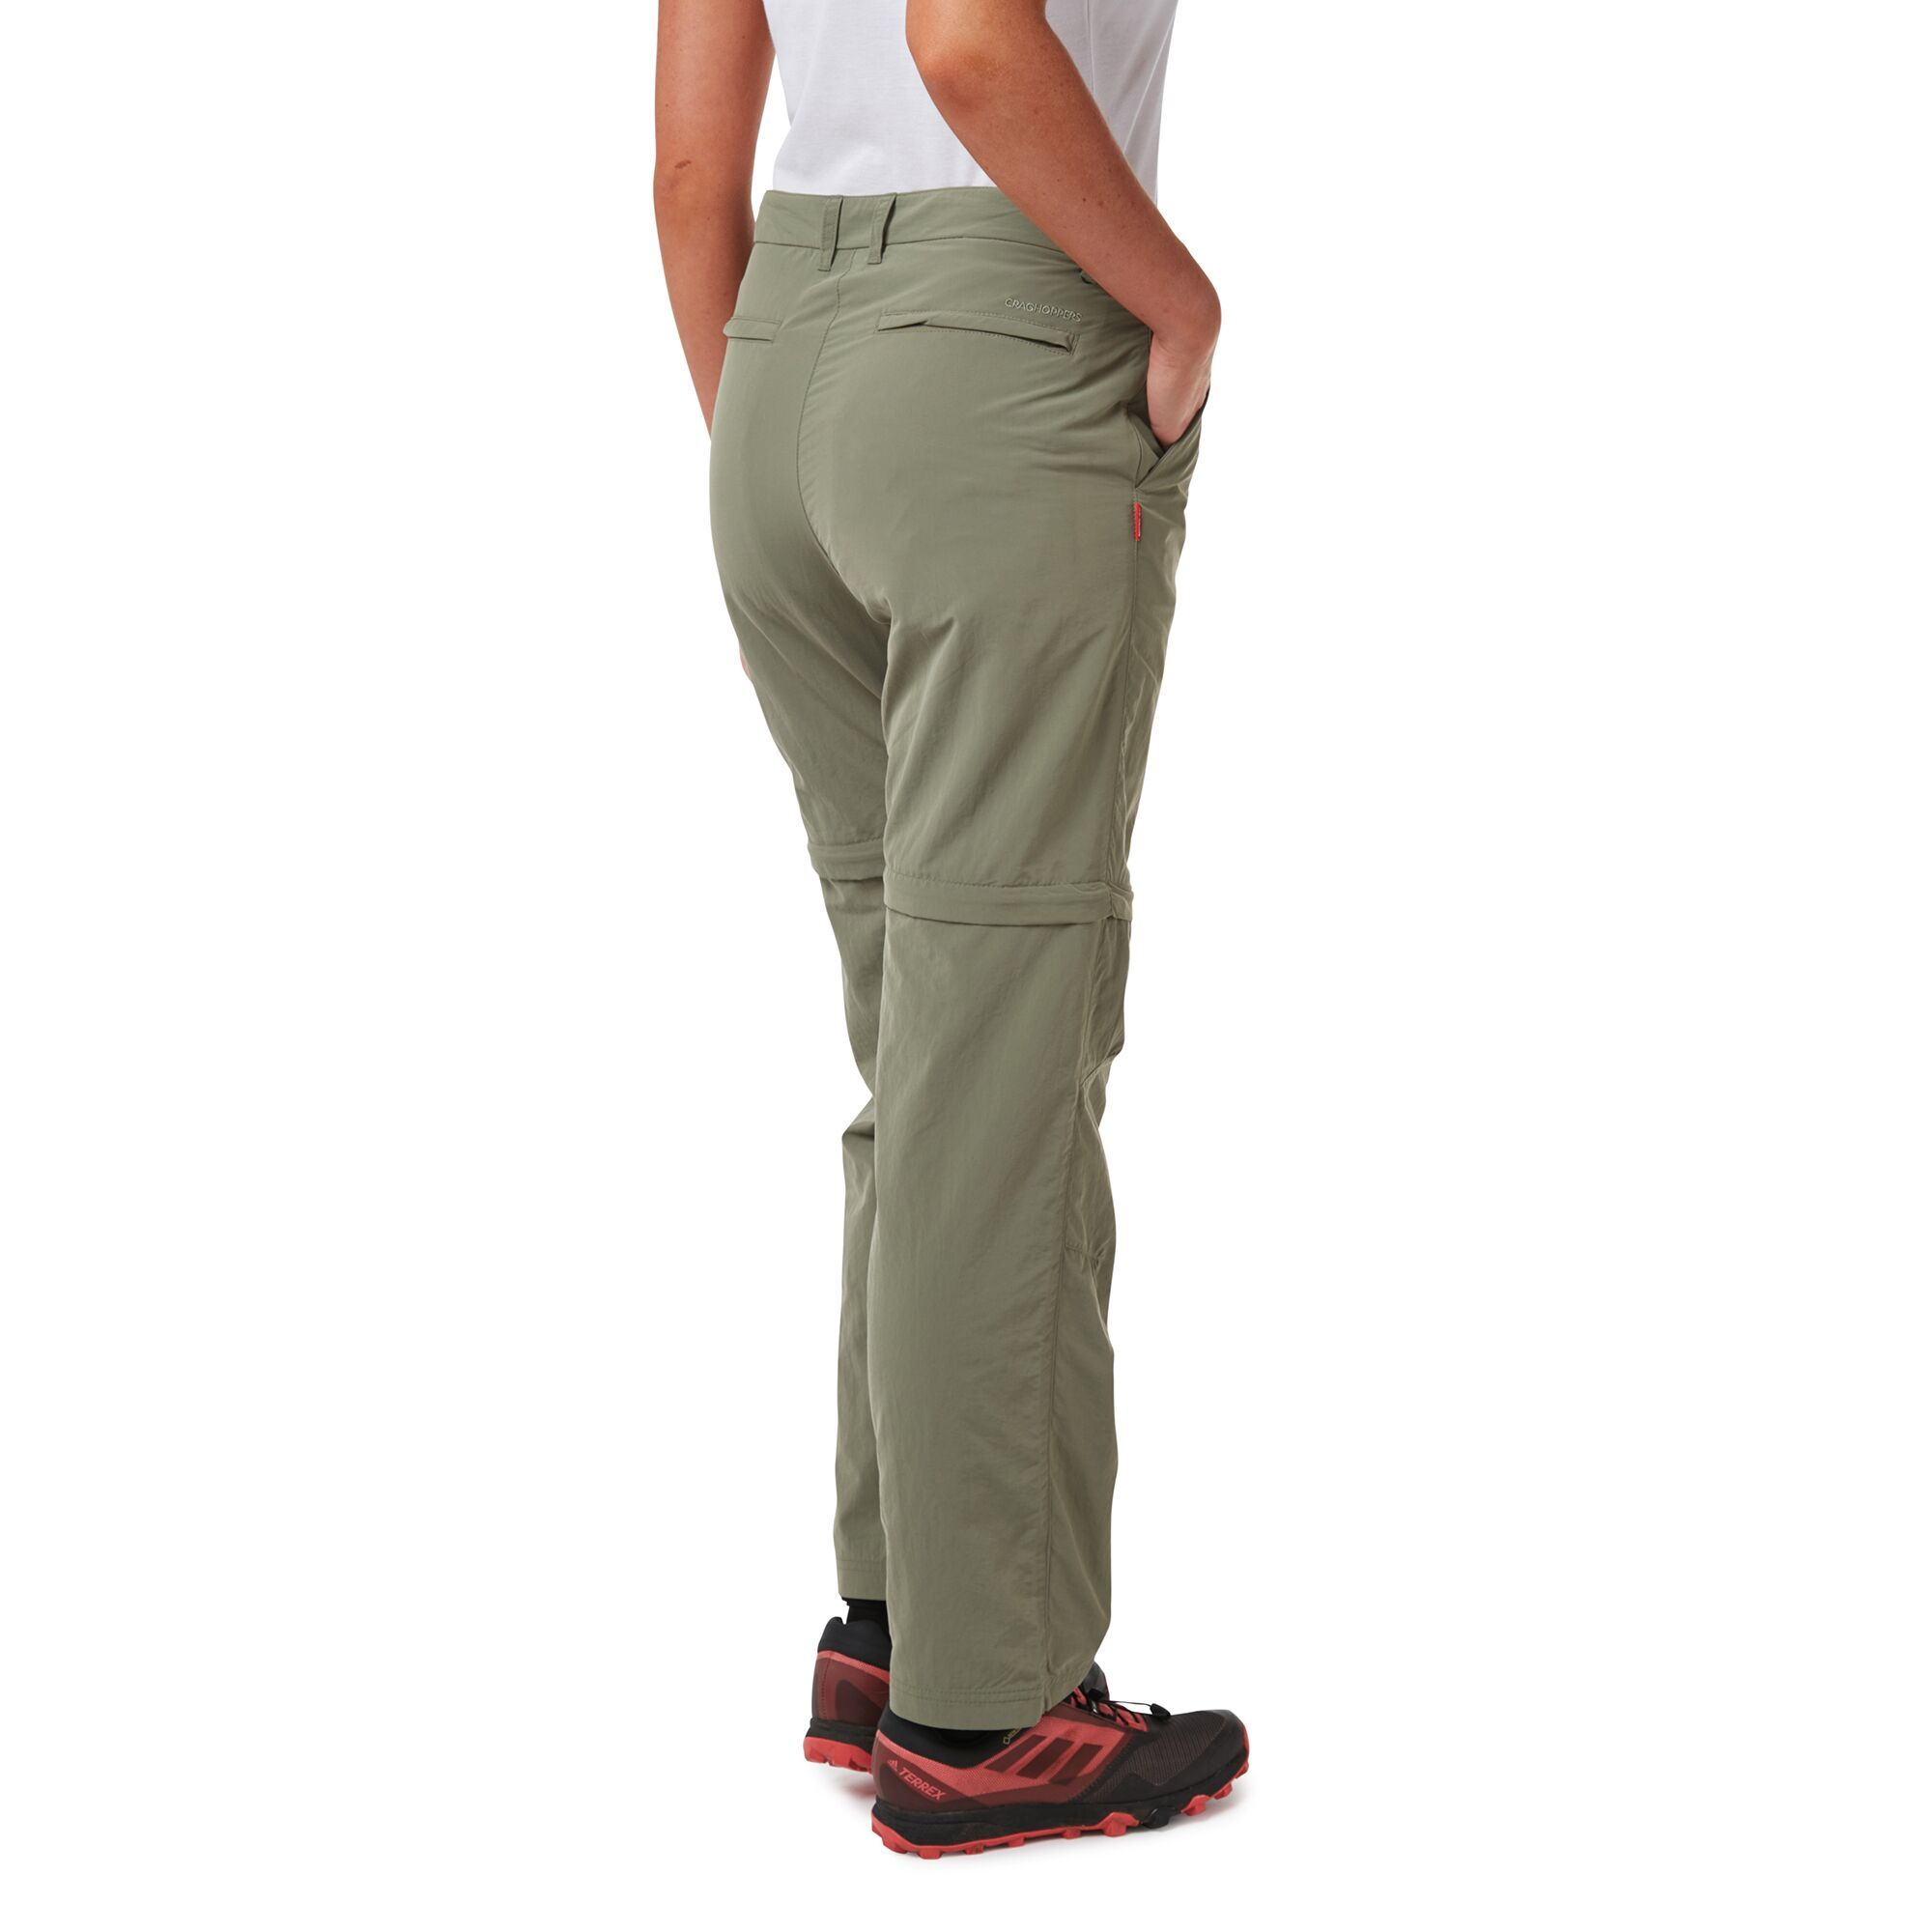 Craghoppers-Pantalon-CONVERTIBLE-Femme-CG1098 miniature 8